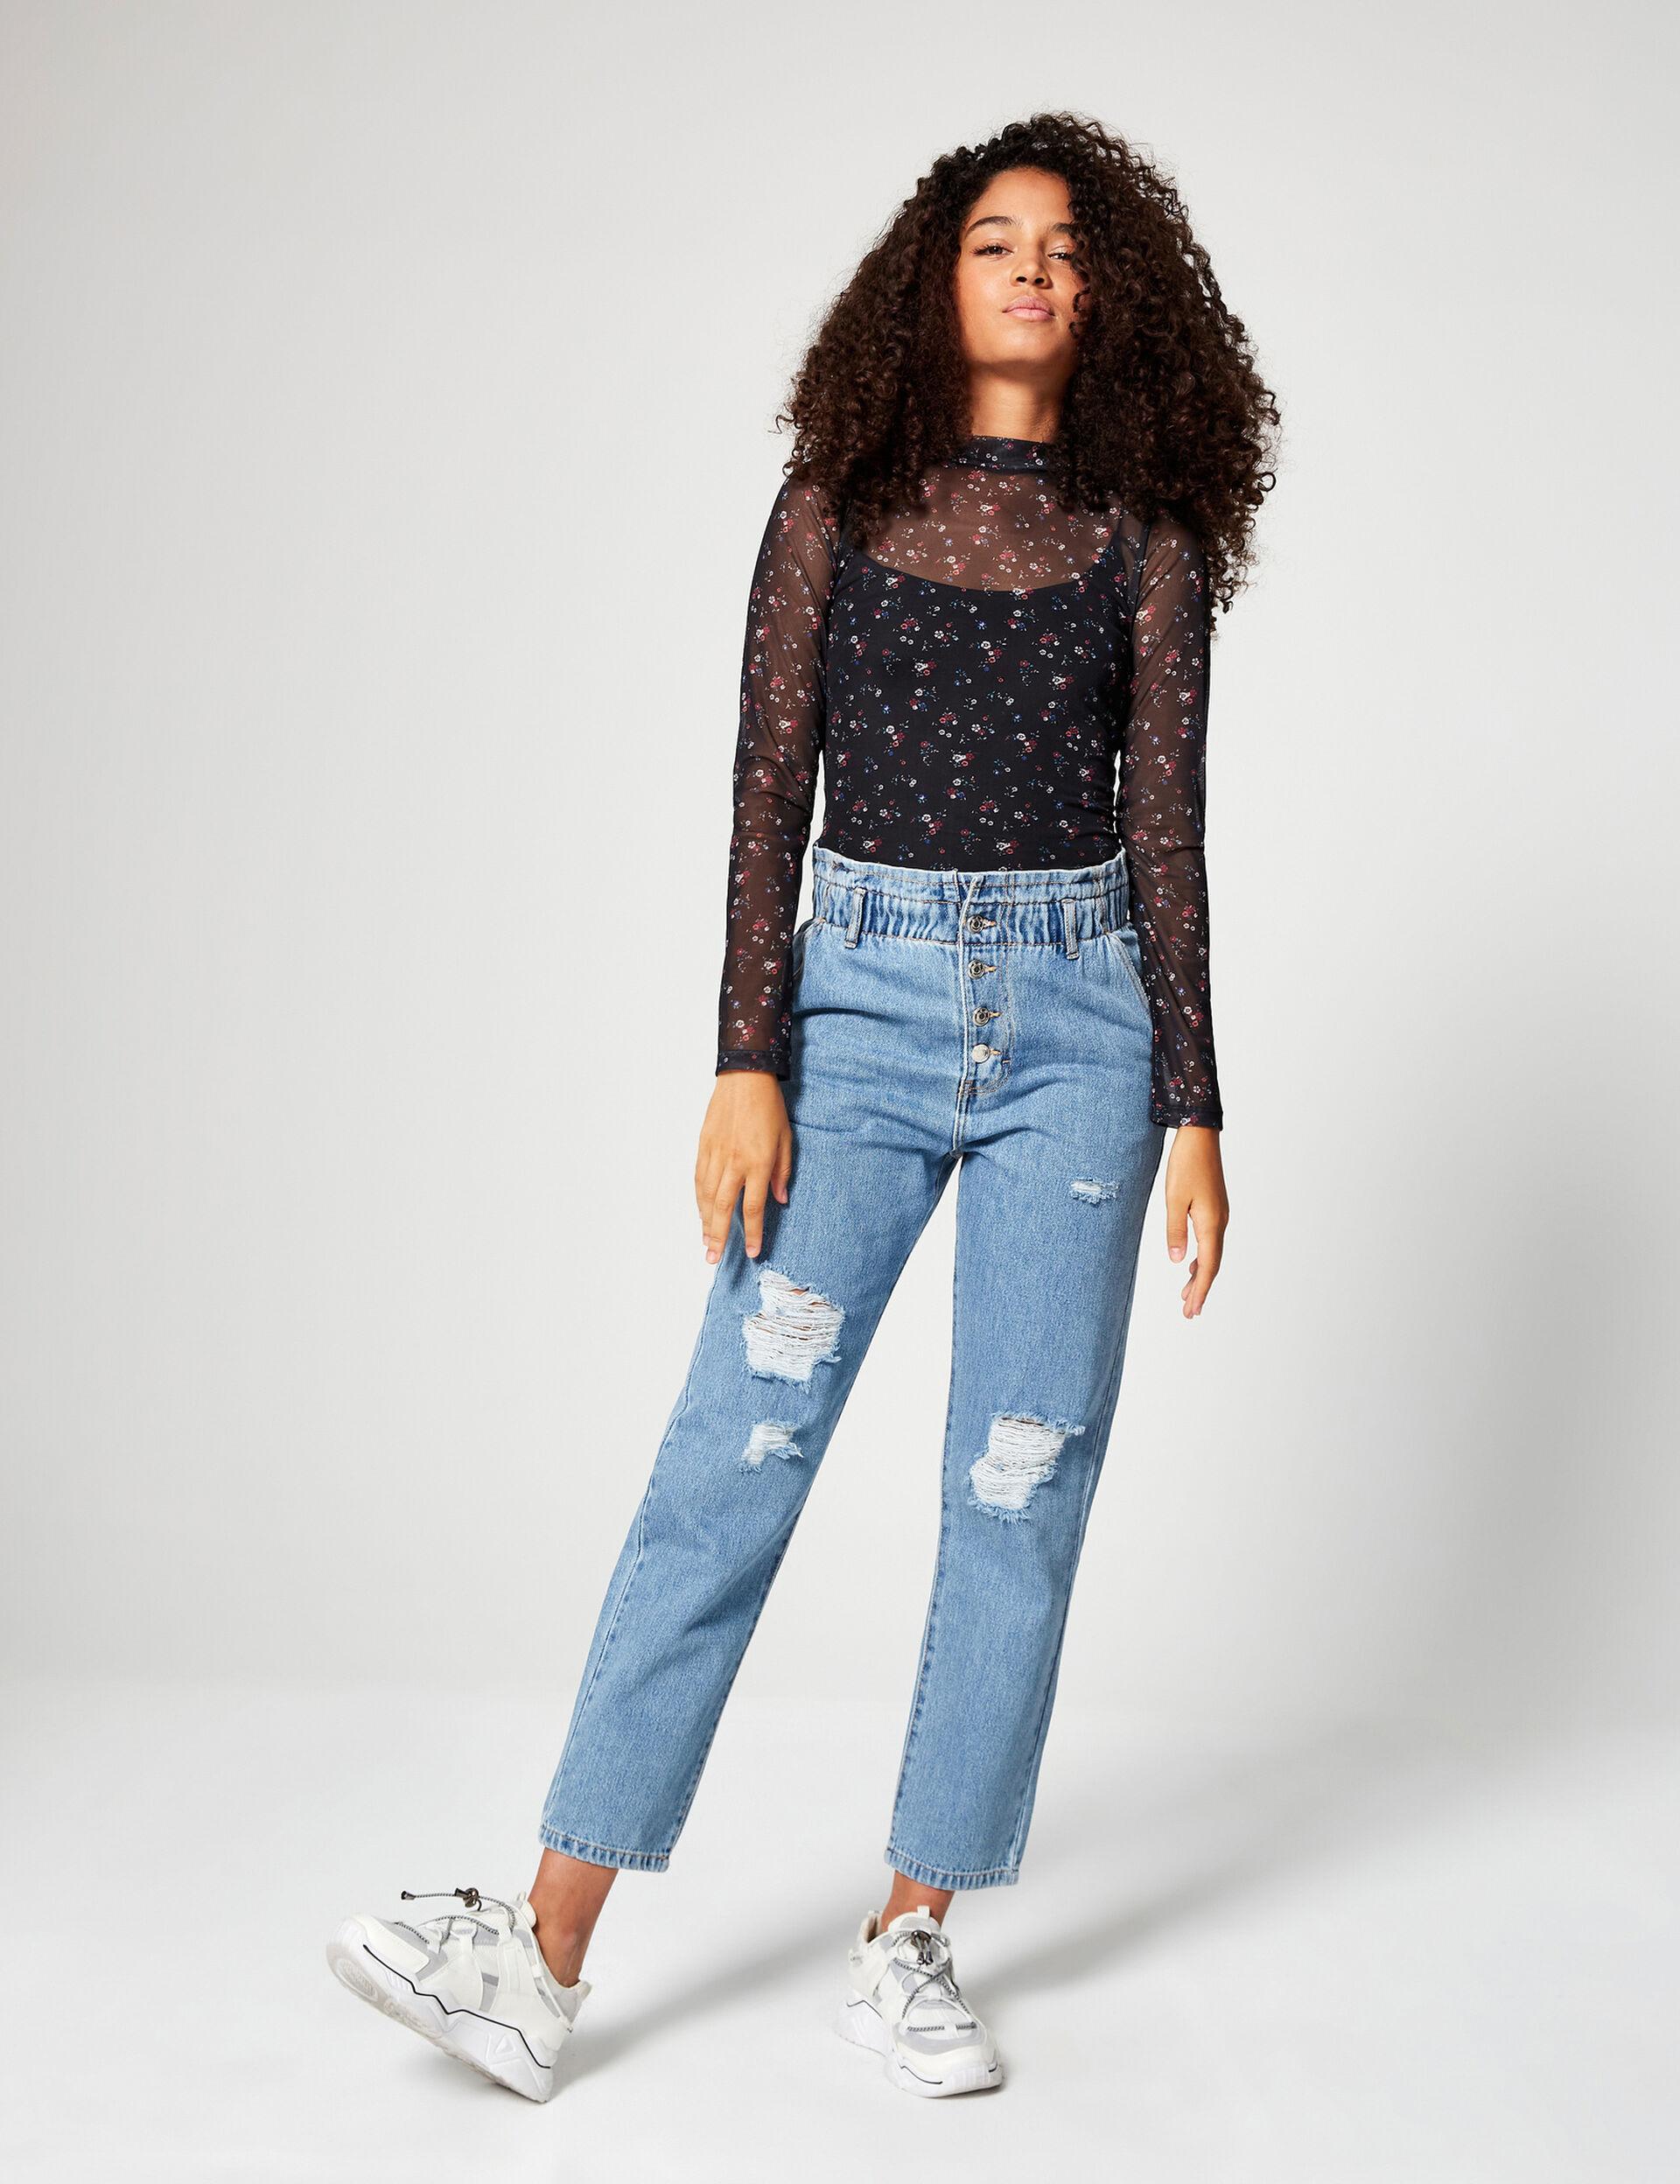 High-waisted boyfriend jeans